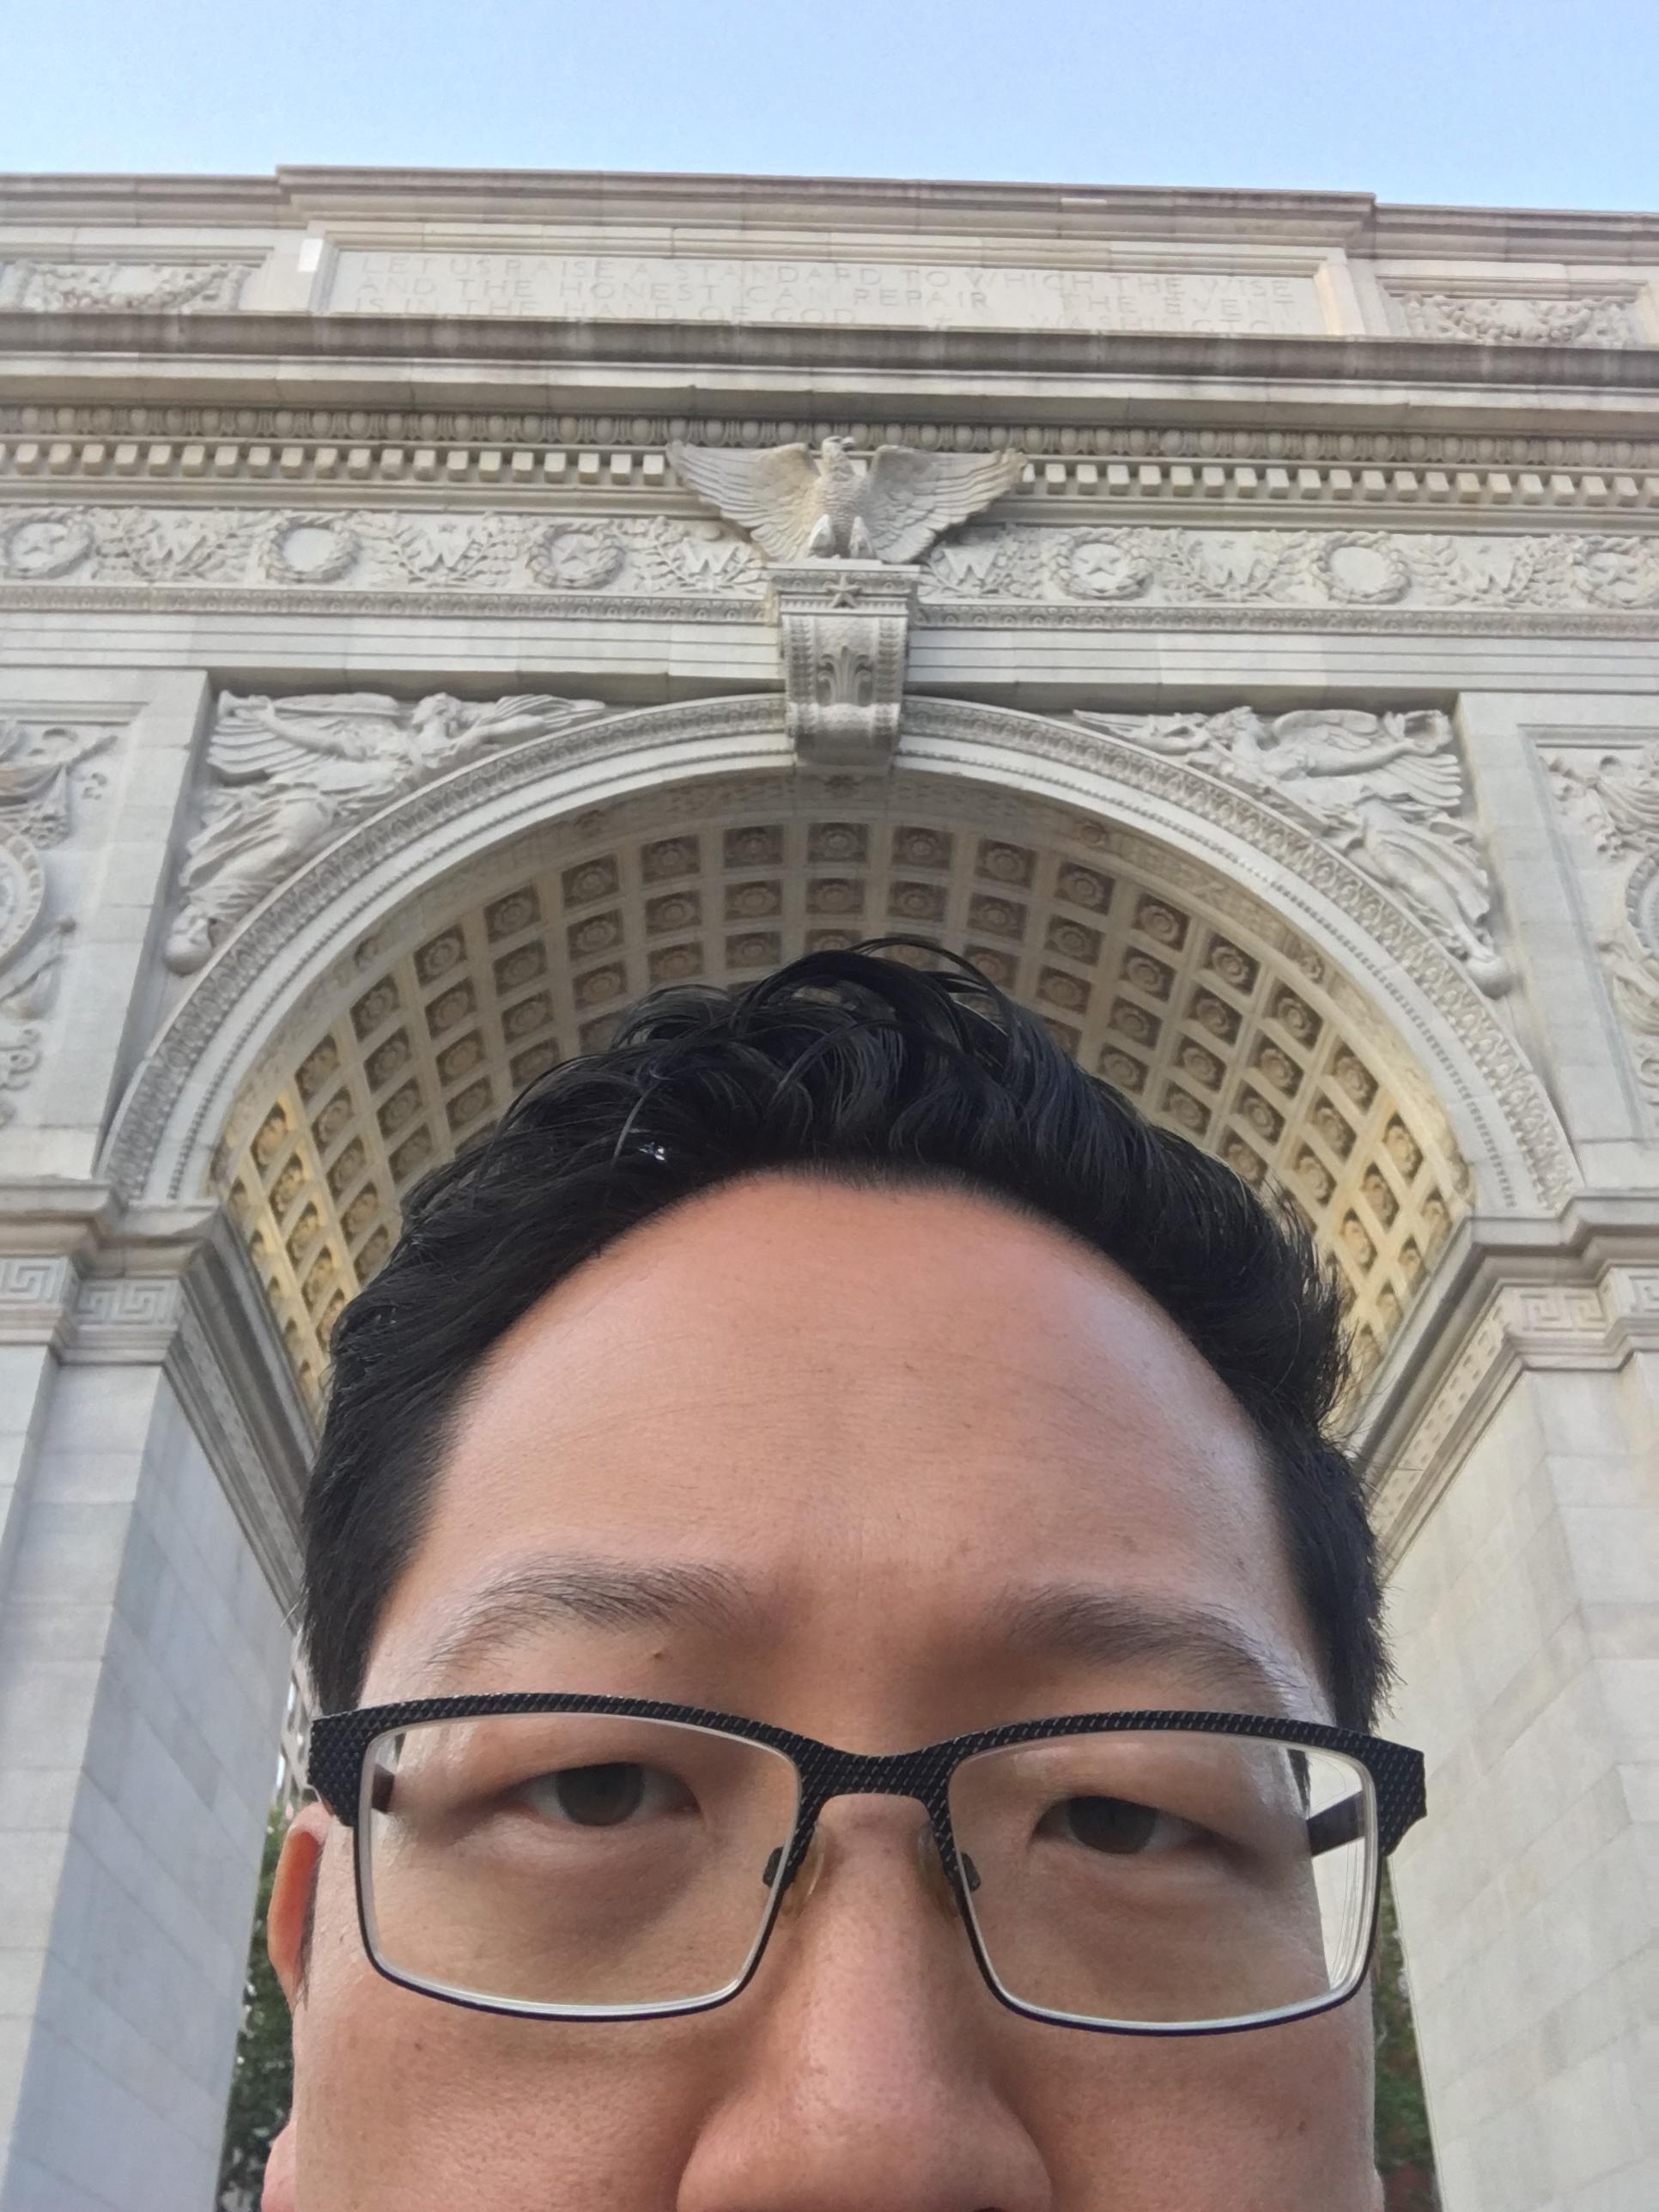 Strolling thru Washington Square Park